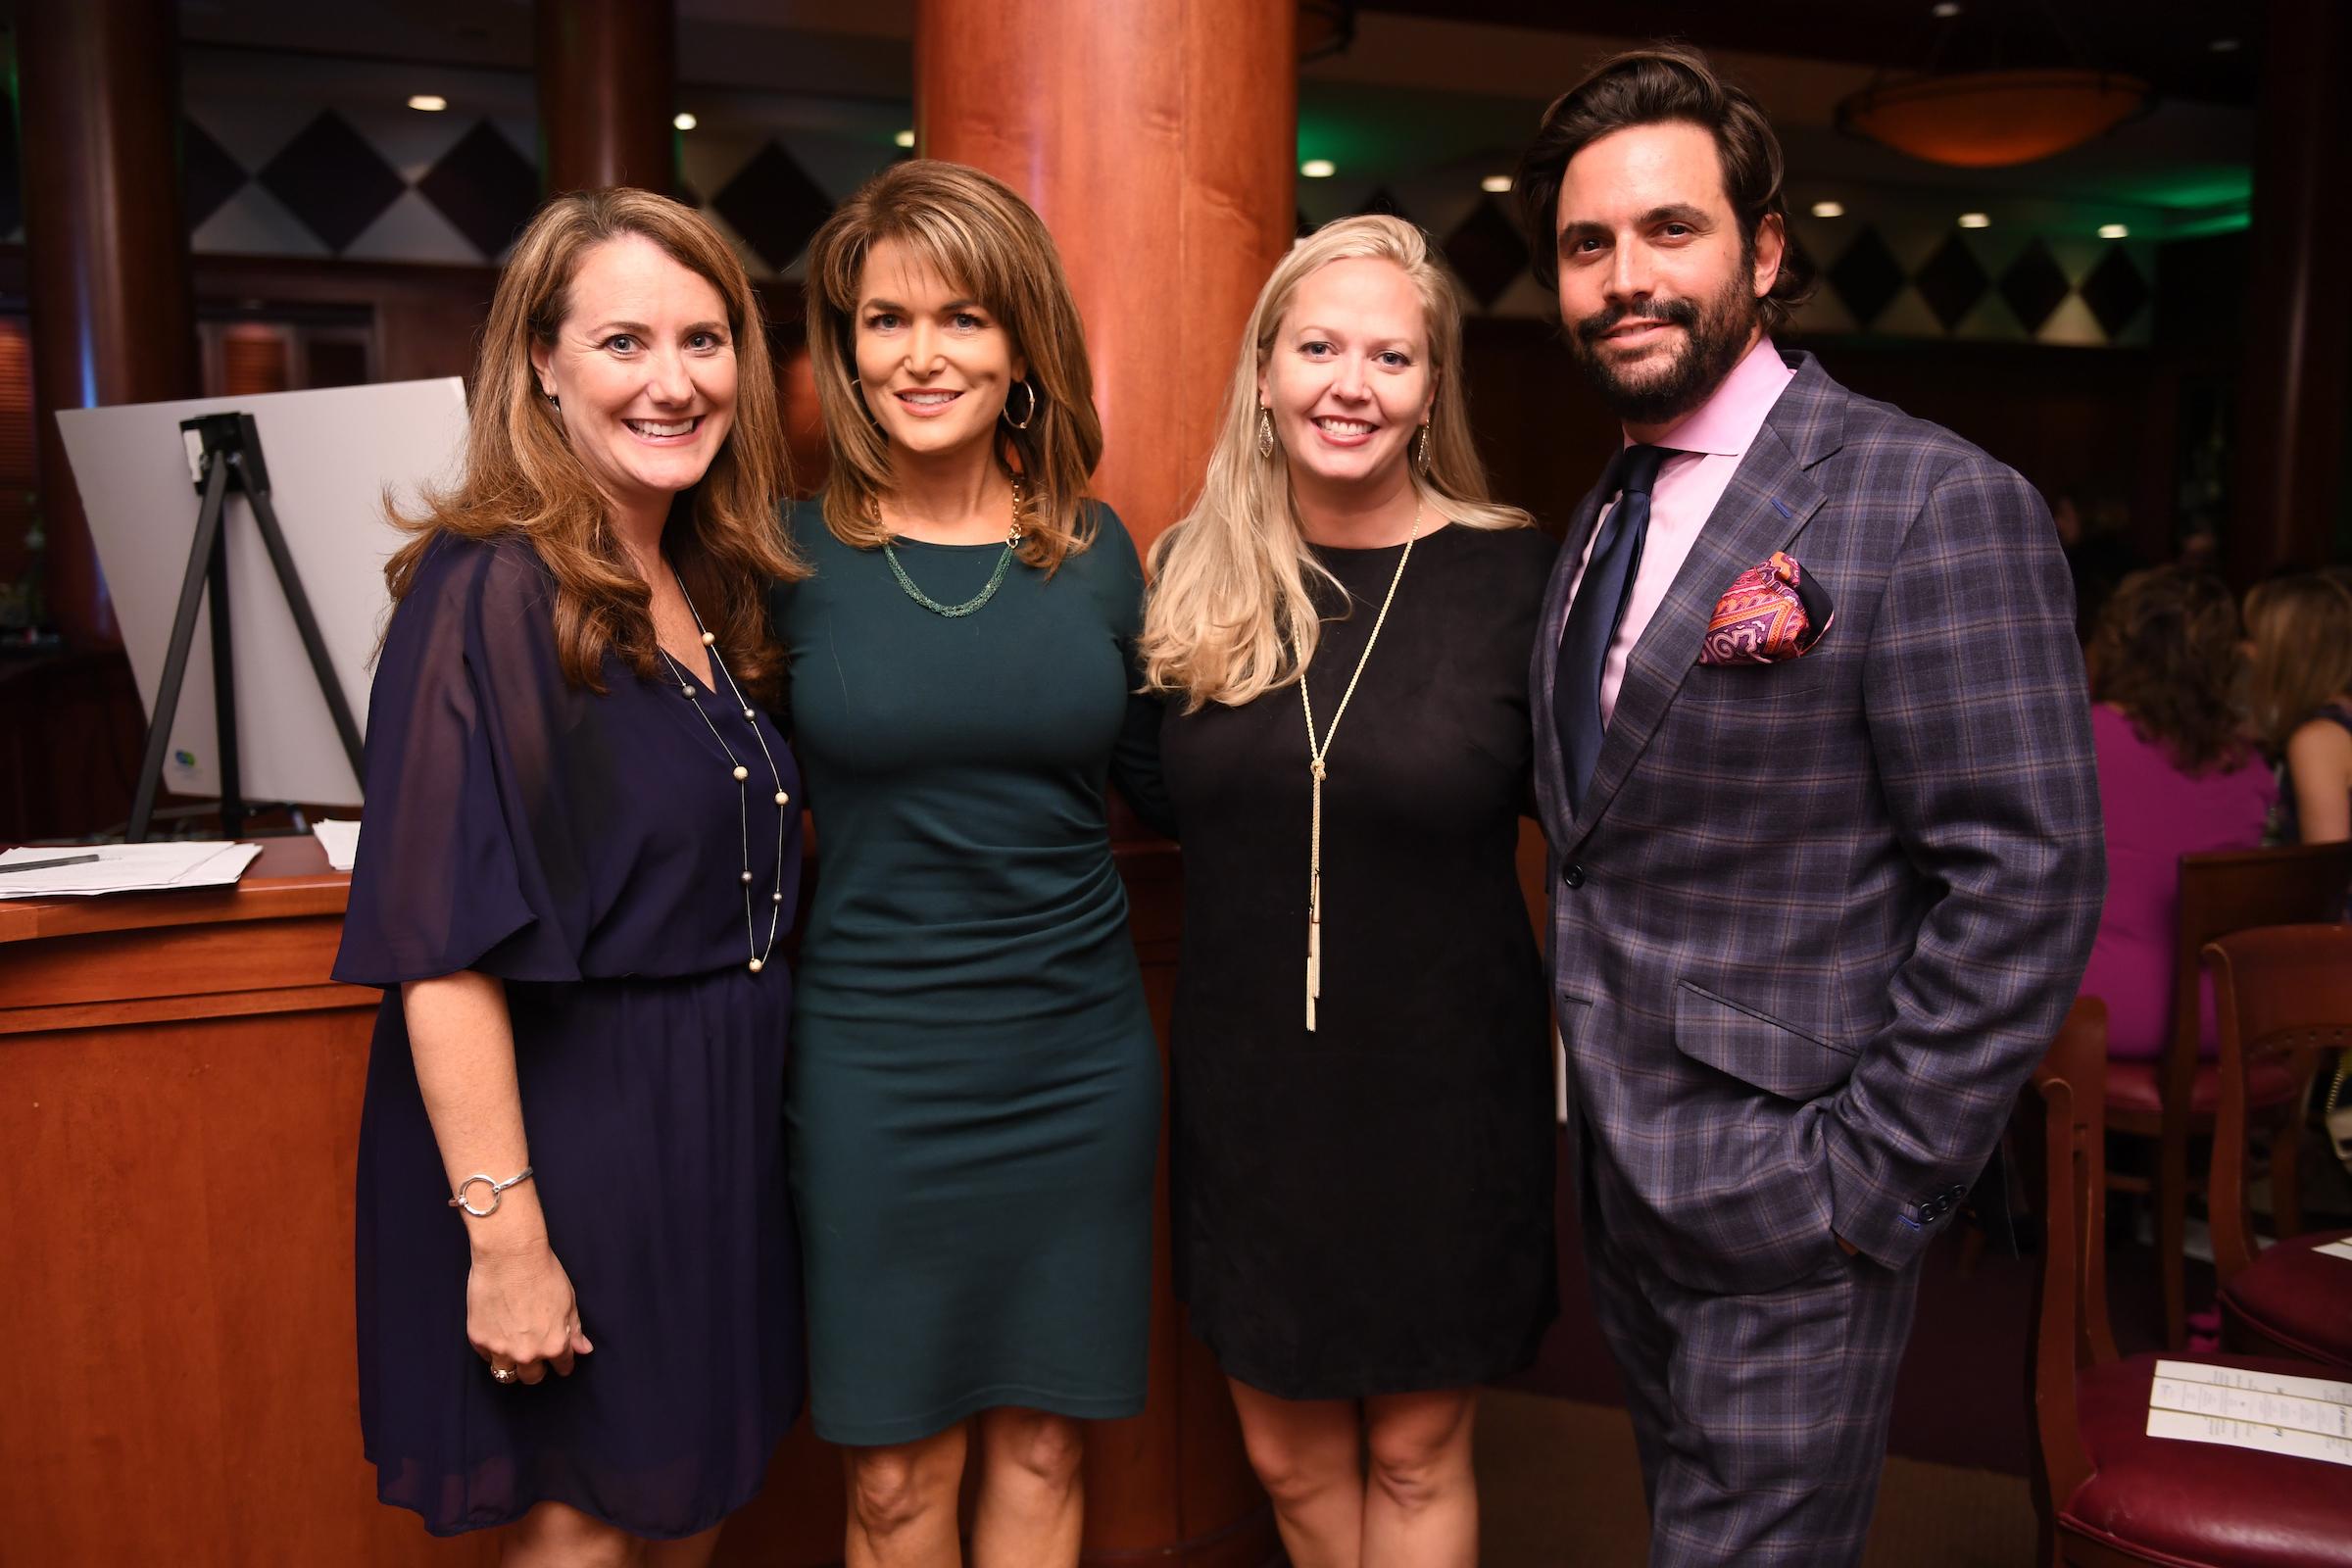 Lynn Wheeler, Melissa Wilson, Elizabeth Haines and Sam Governale